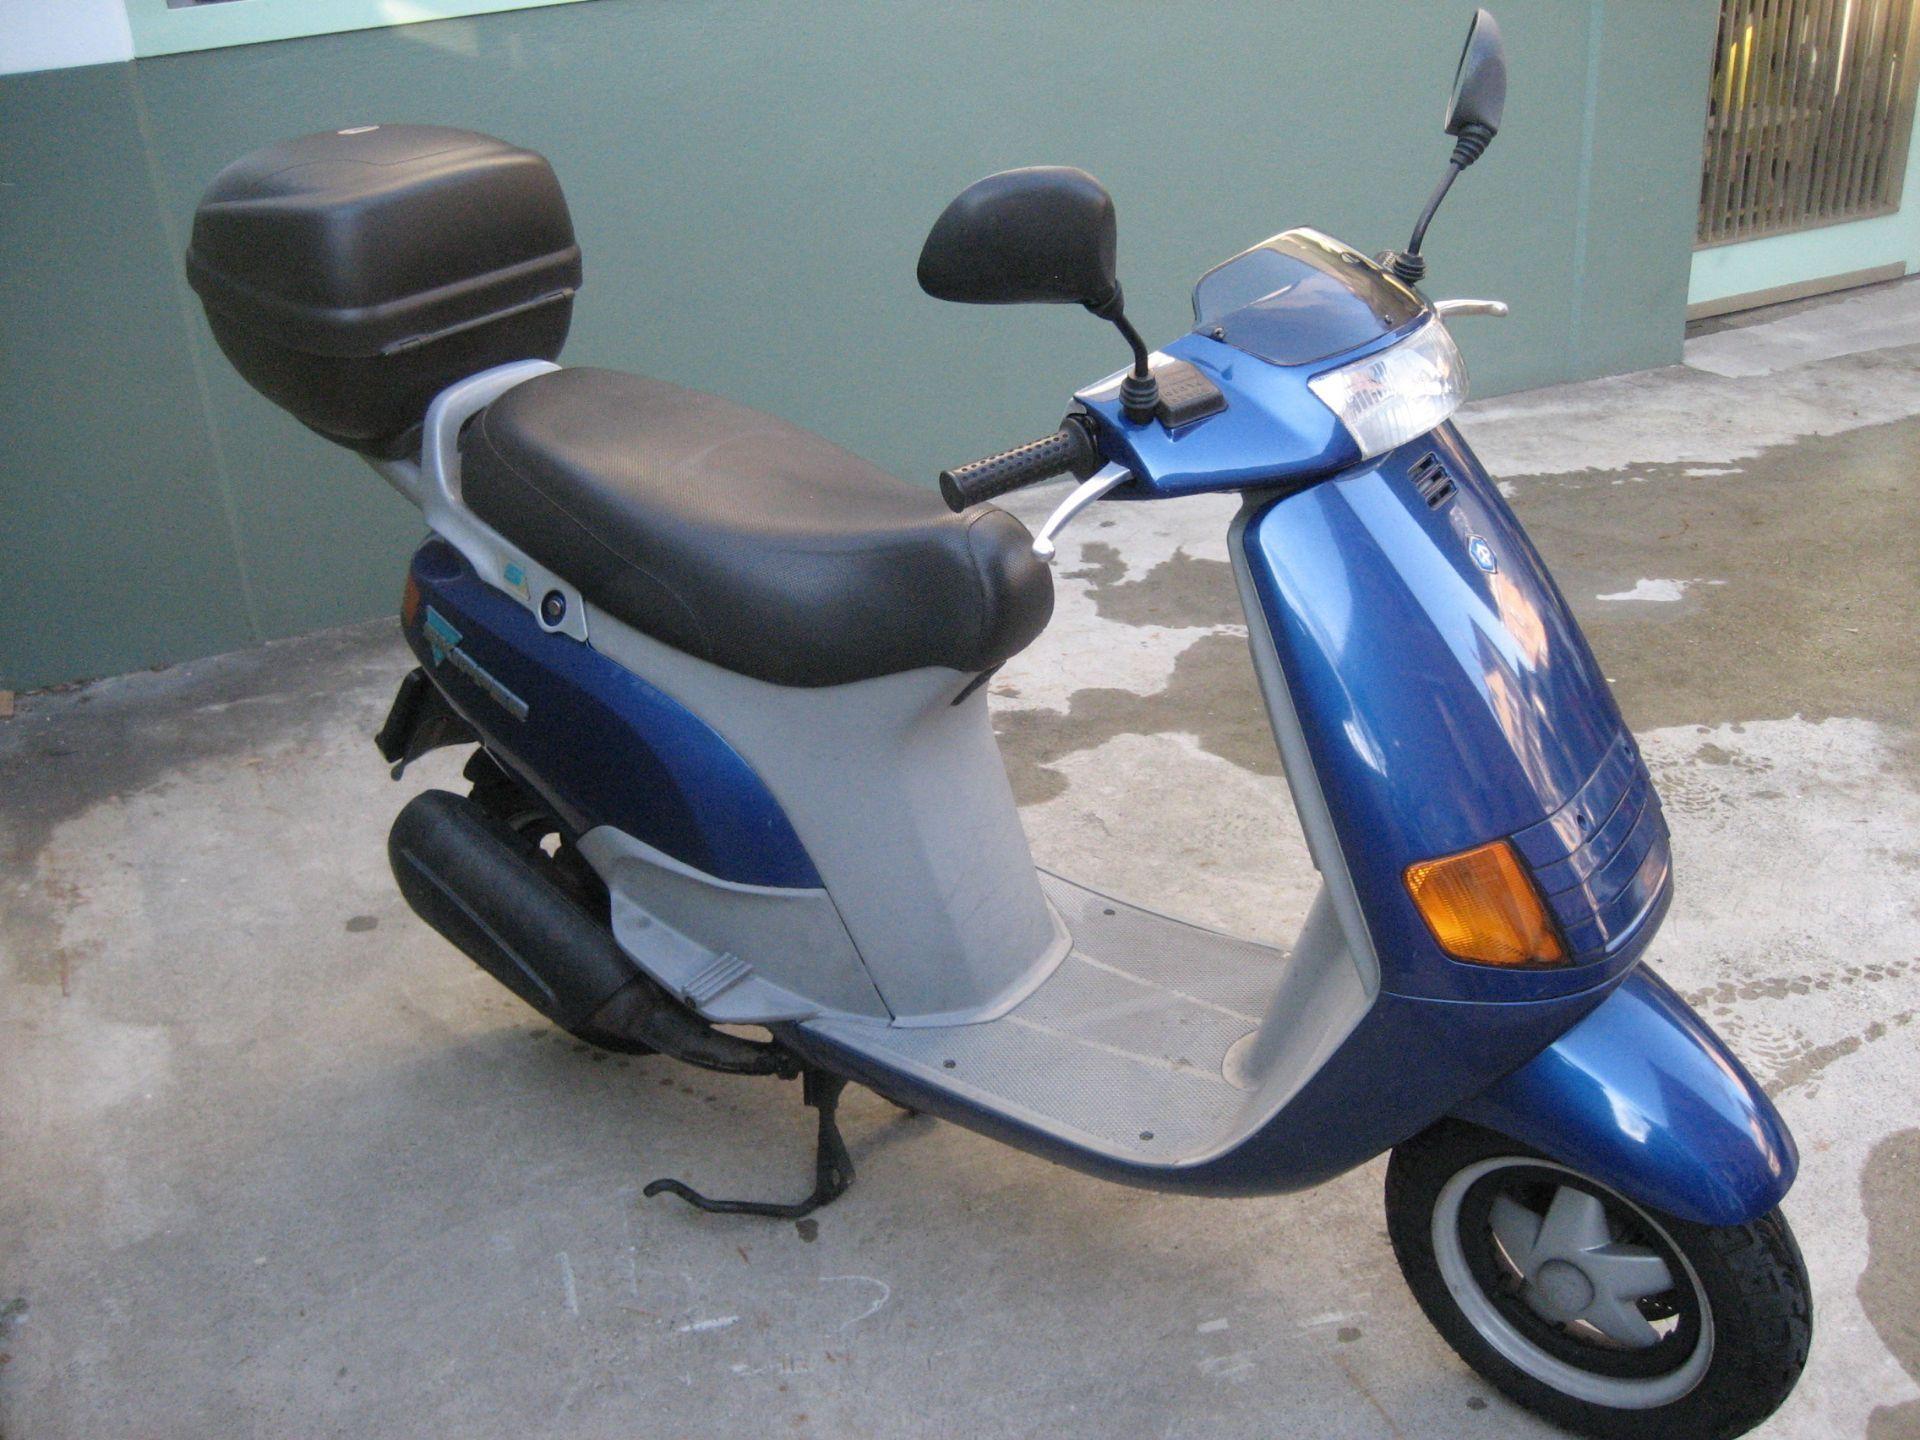 moto occasions acheter piaggio skipper 125 velos motos. Black Bedroom Furniture Sets. Home Design Ideas